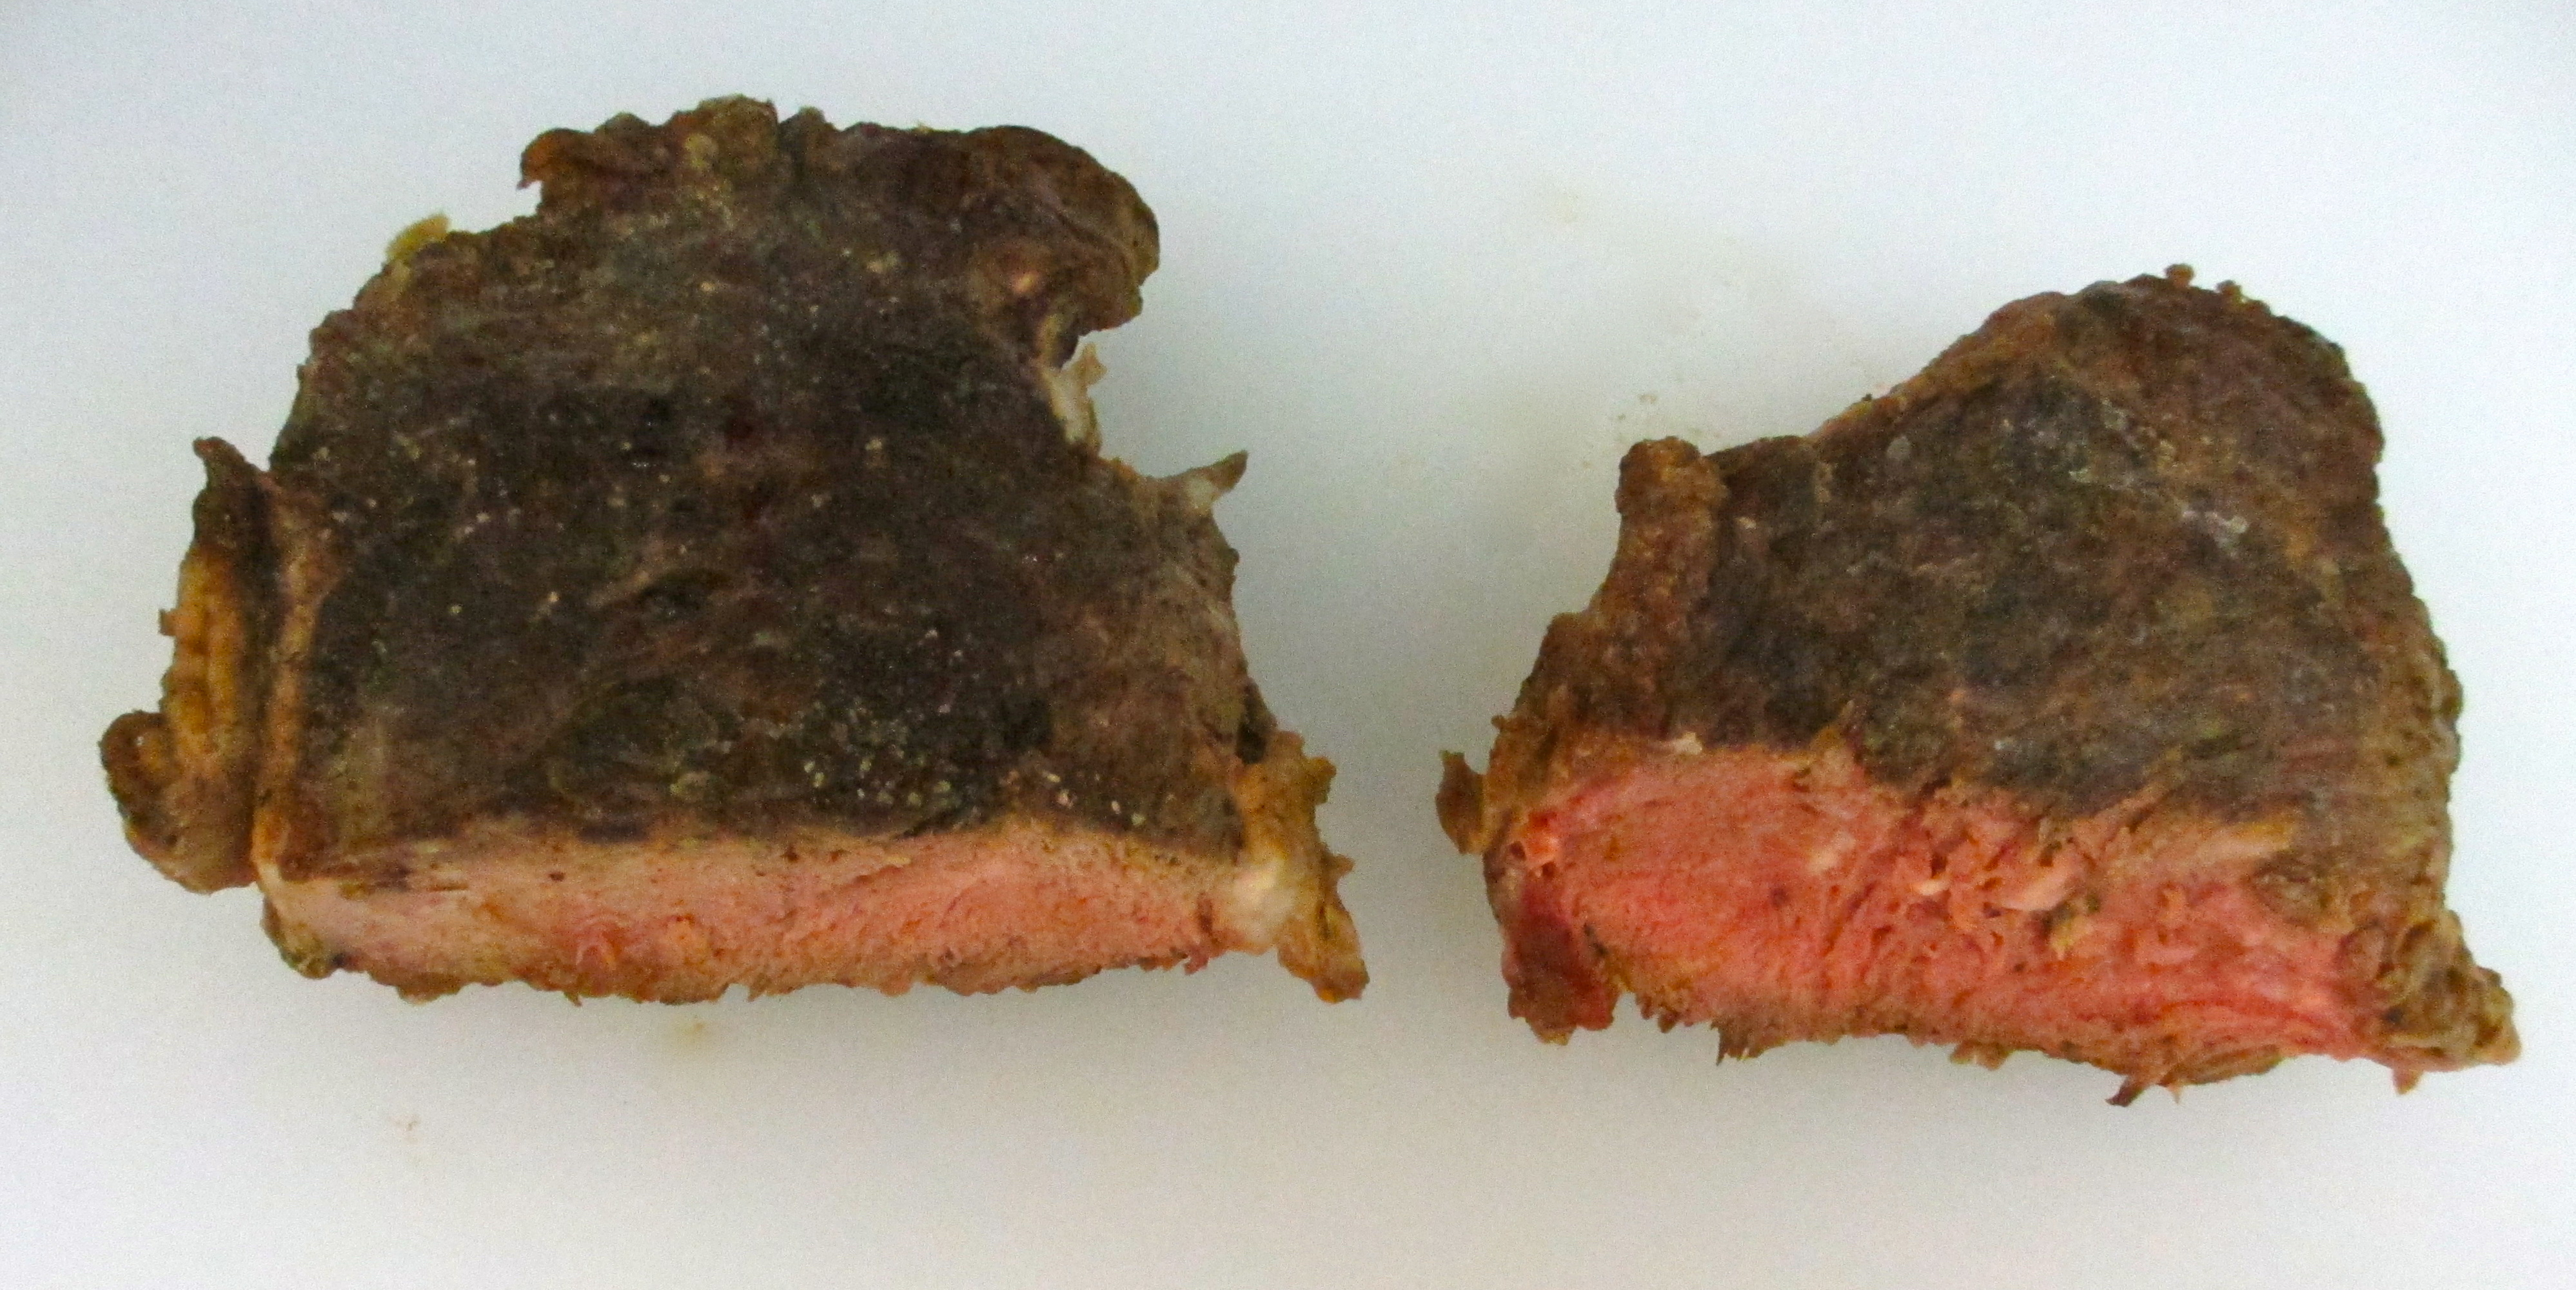 Start with some leftover steak